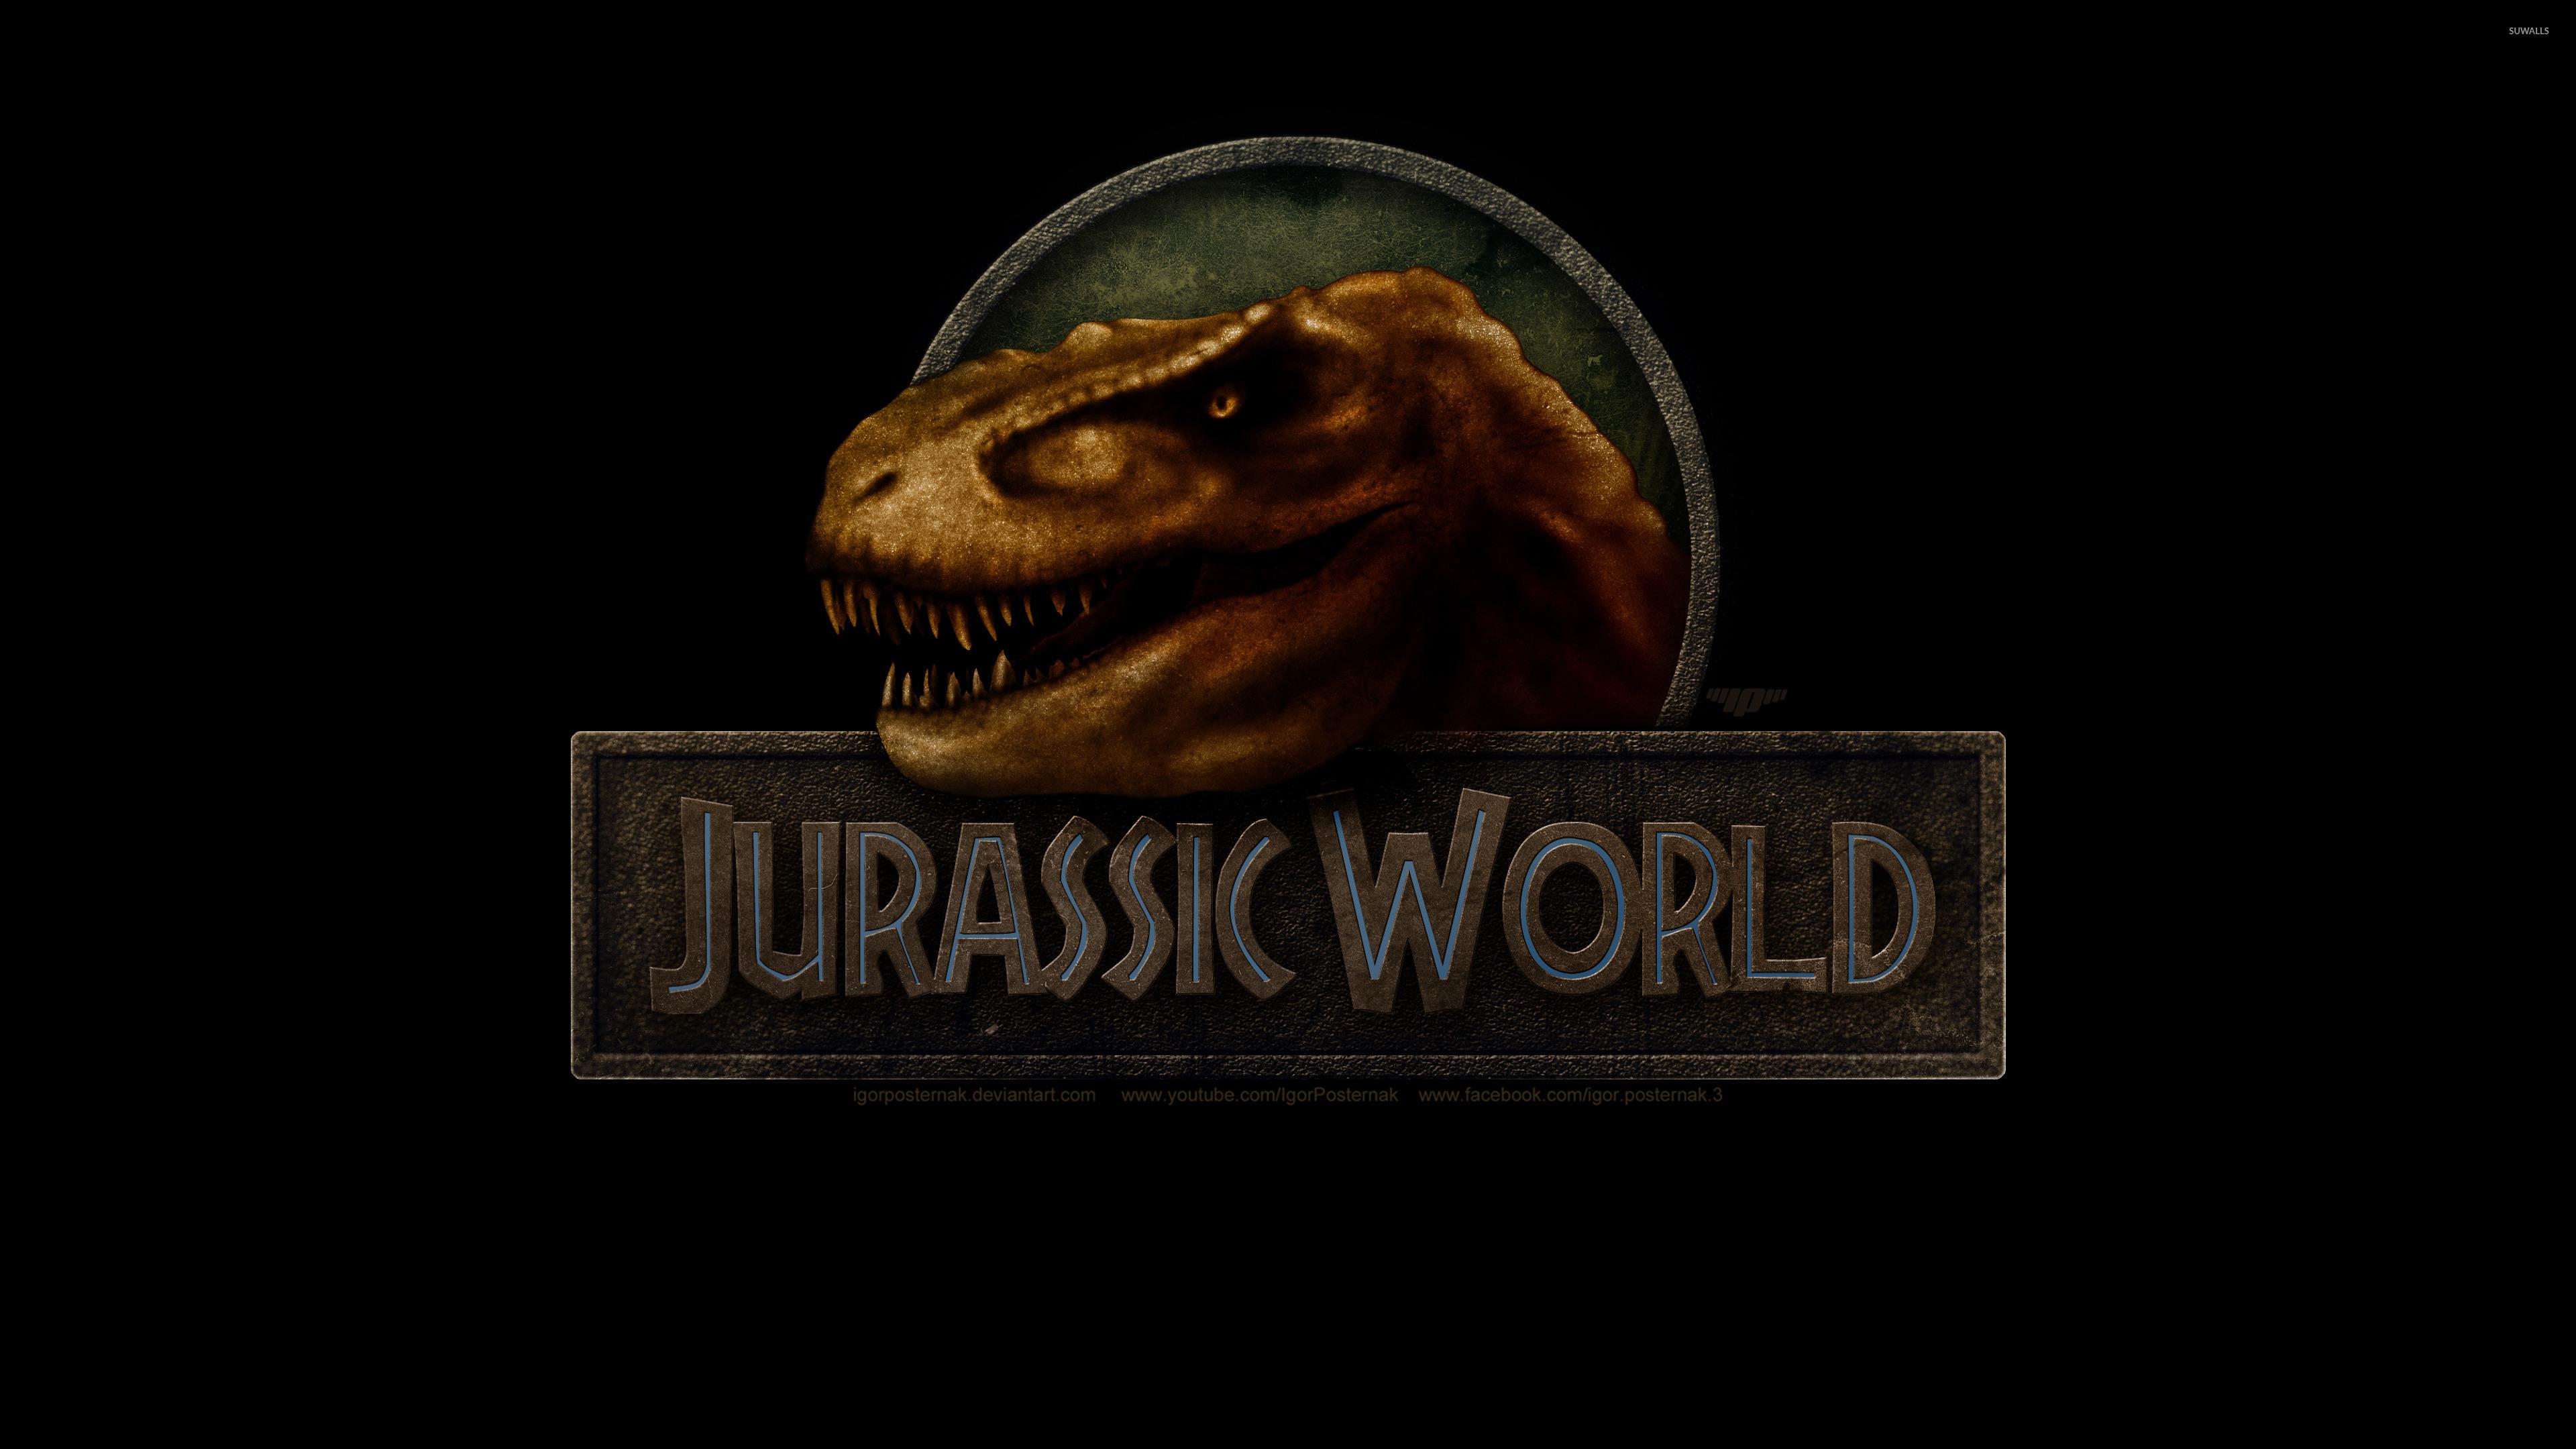 jurassic world 2 - photo #20